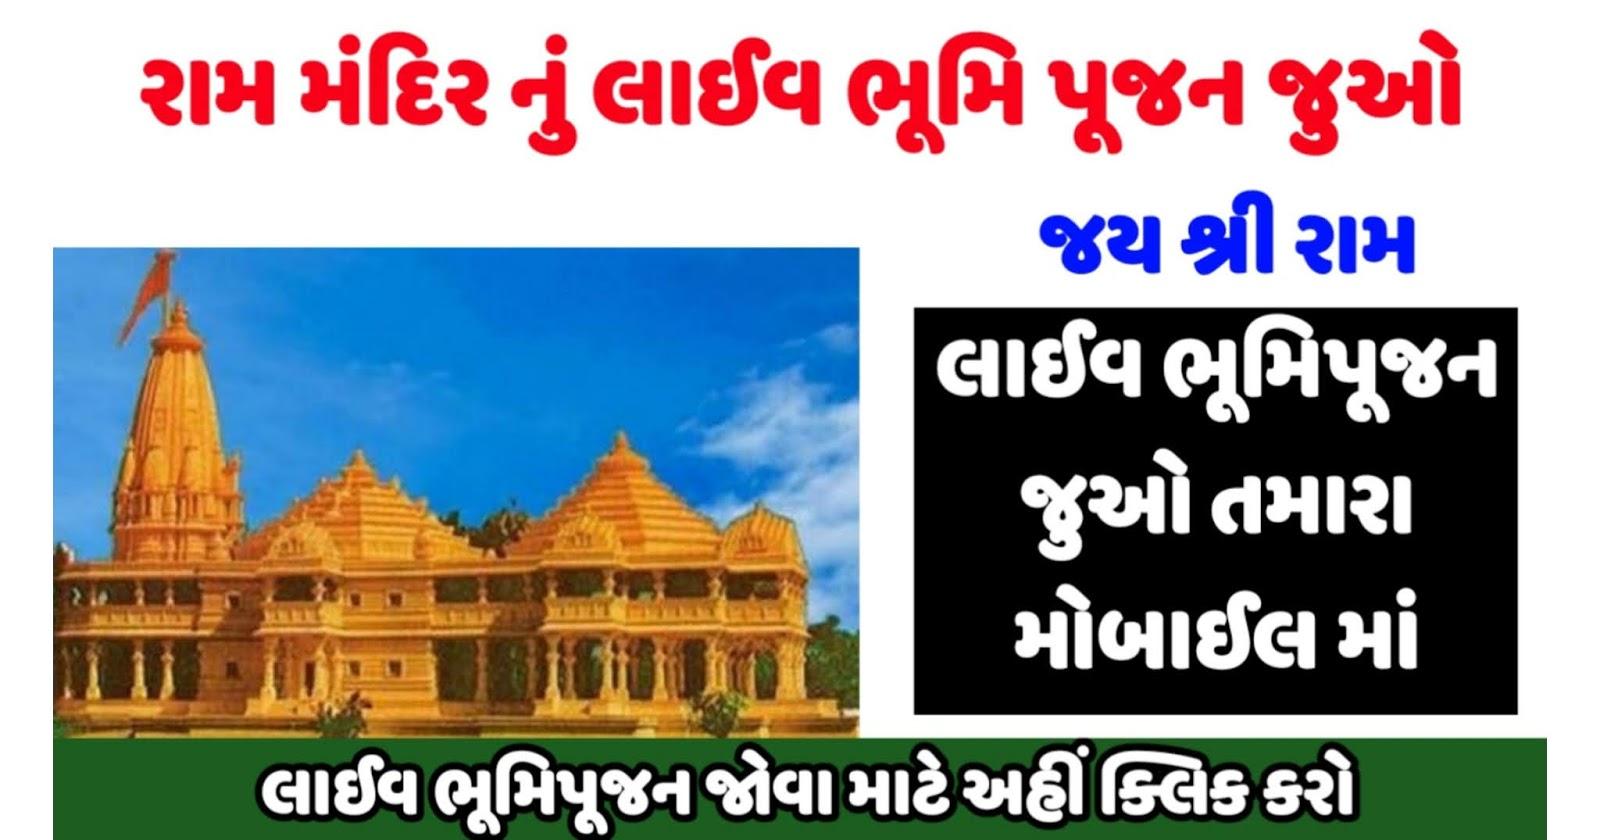 Ram Mandir Live Bhumi Poojan At Ayodhya